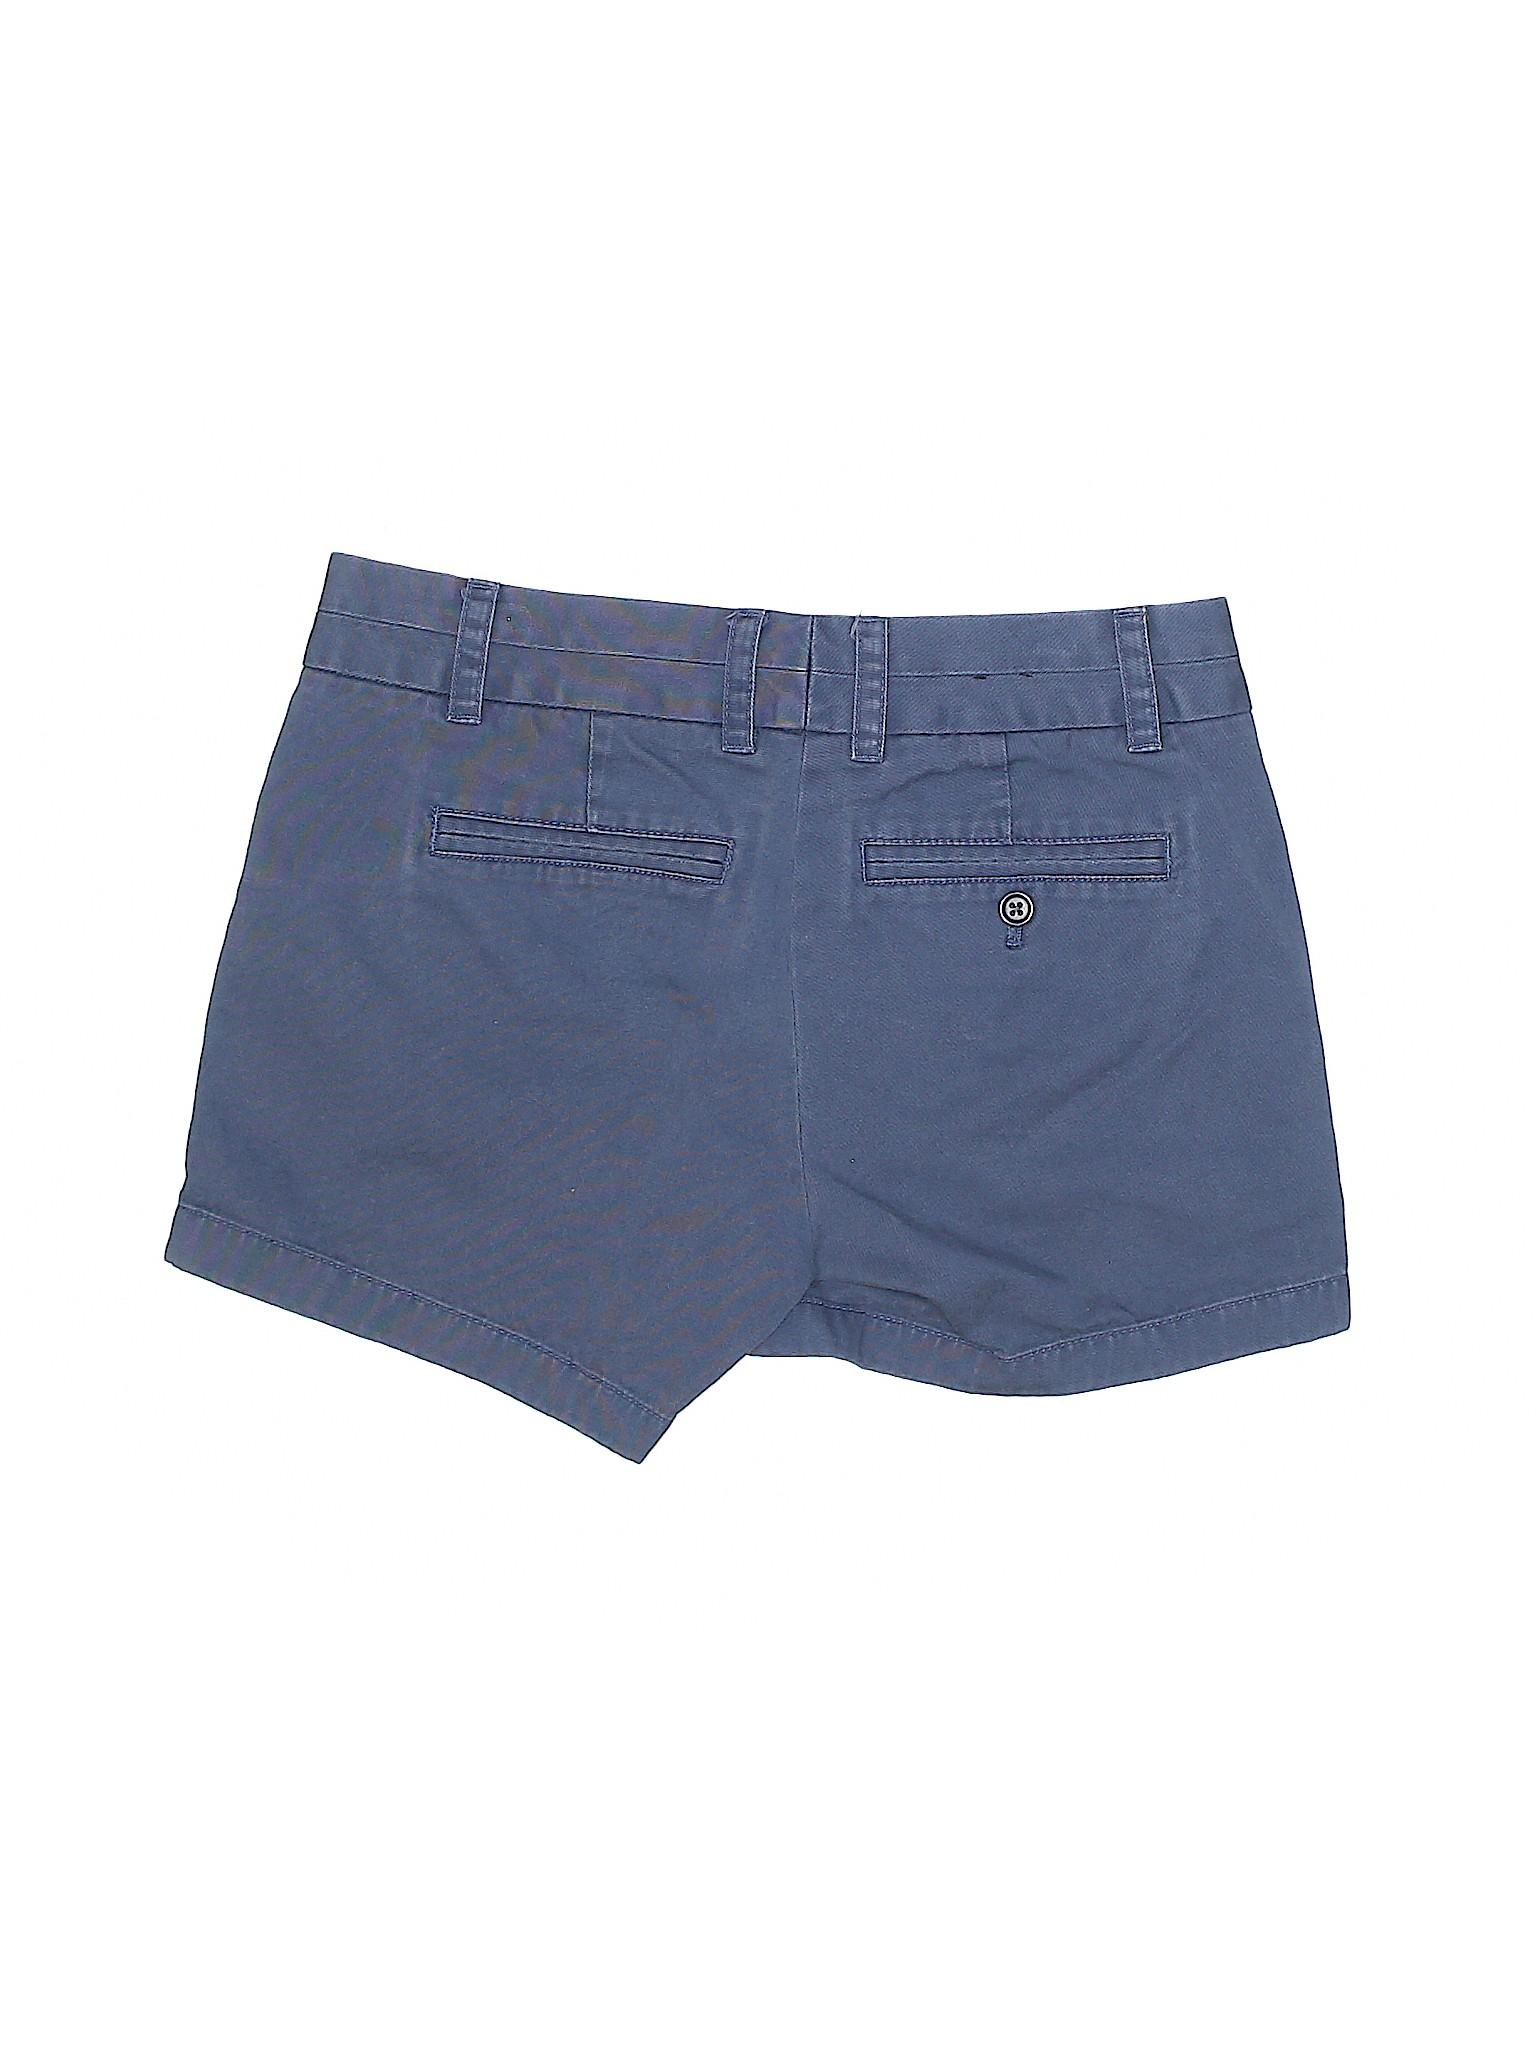 Boutique leisure Crew Shorts Khaki J BBwYCqr